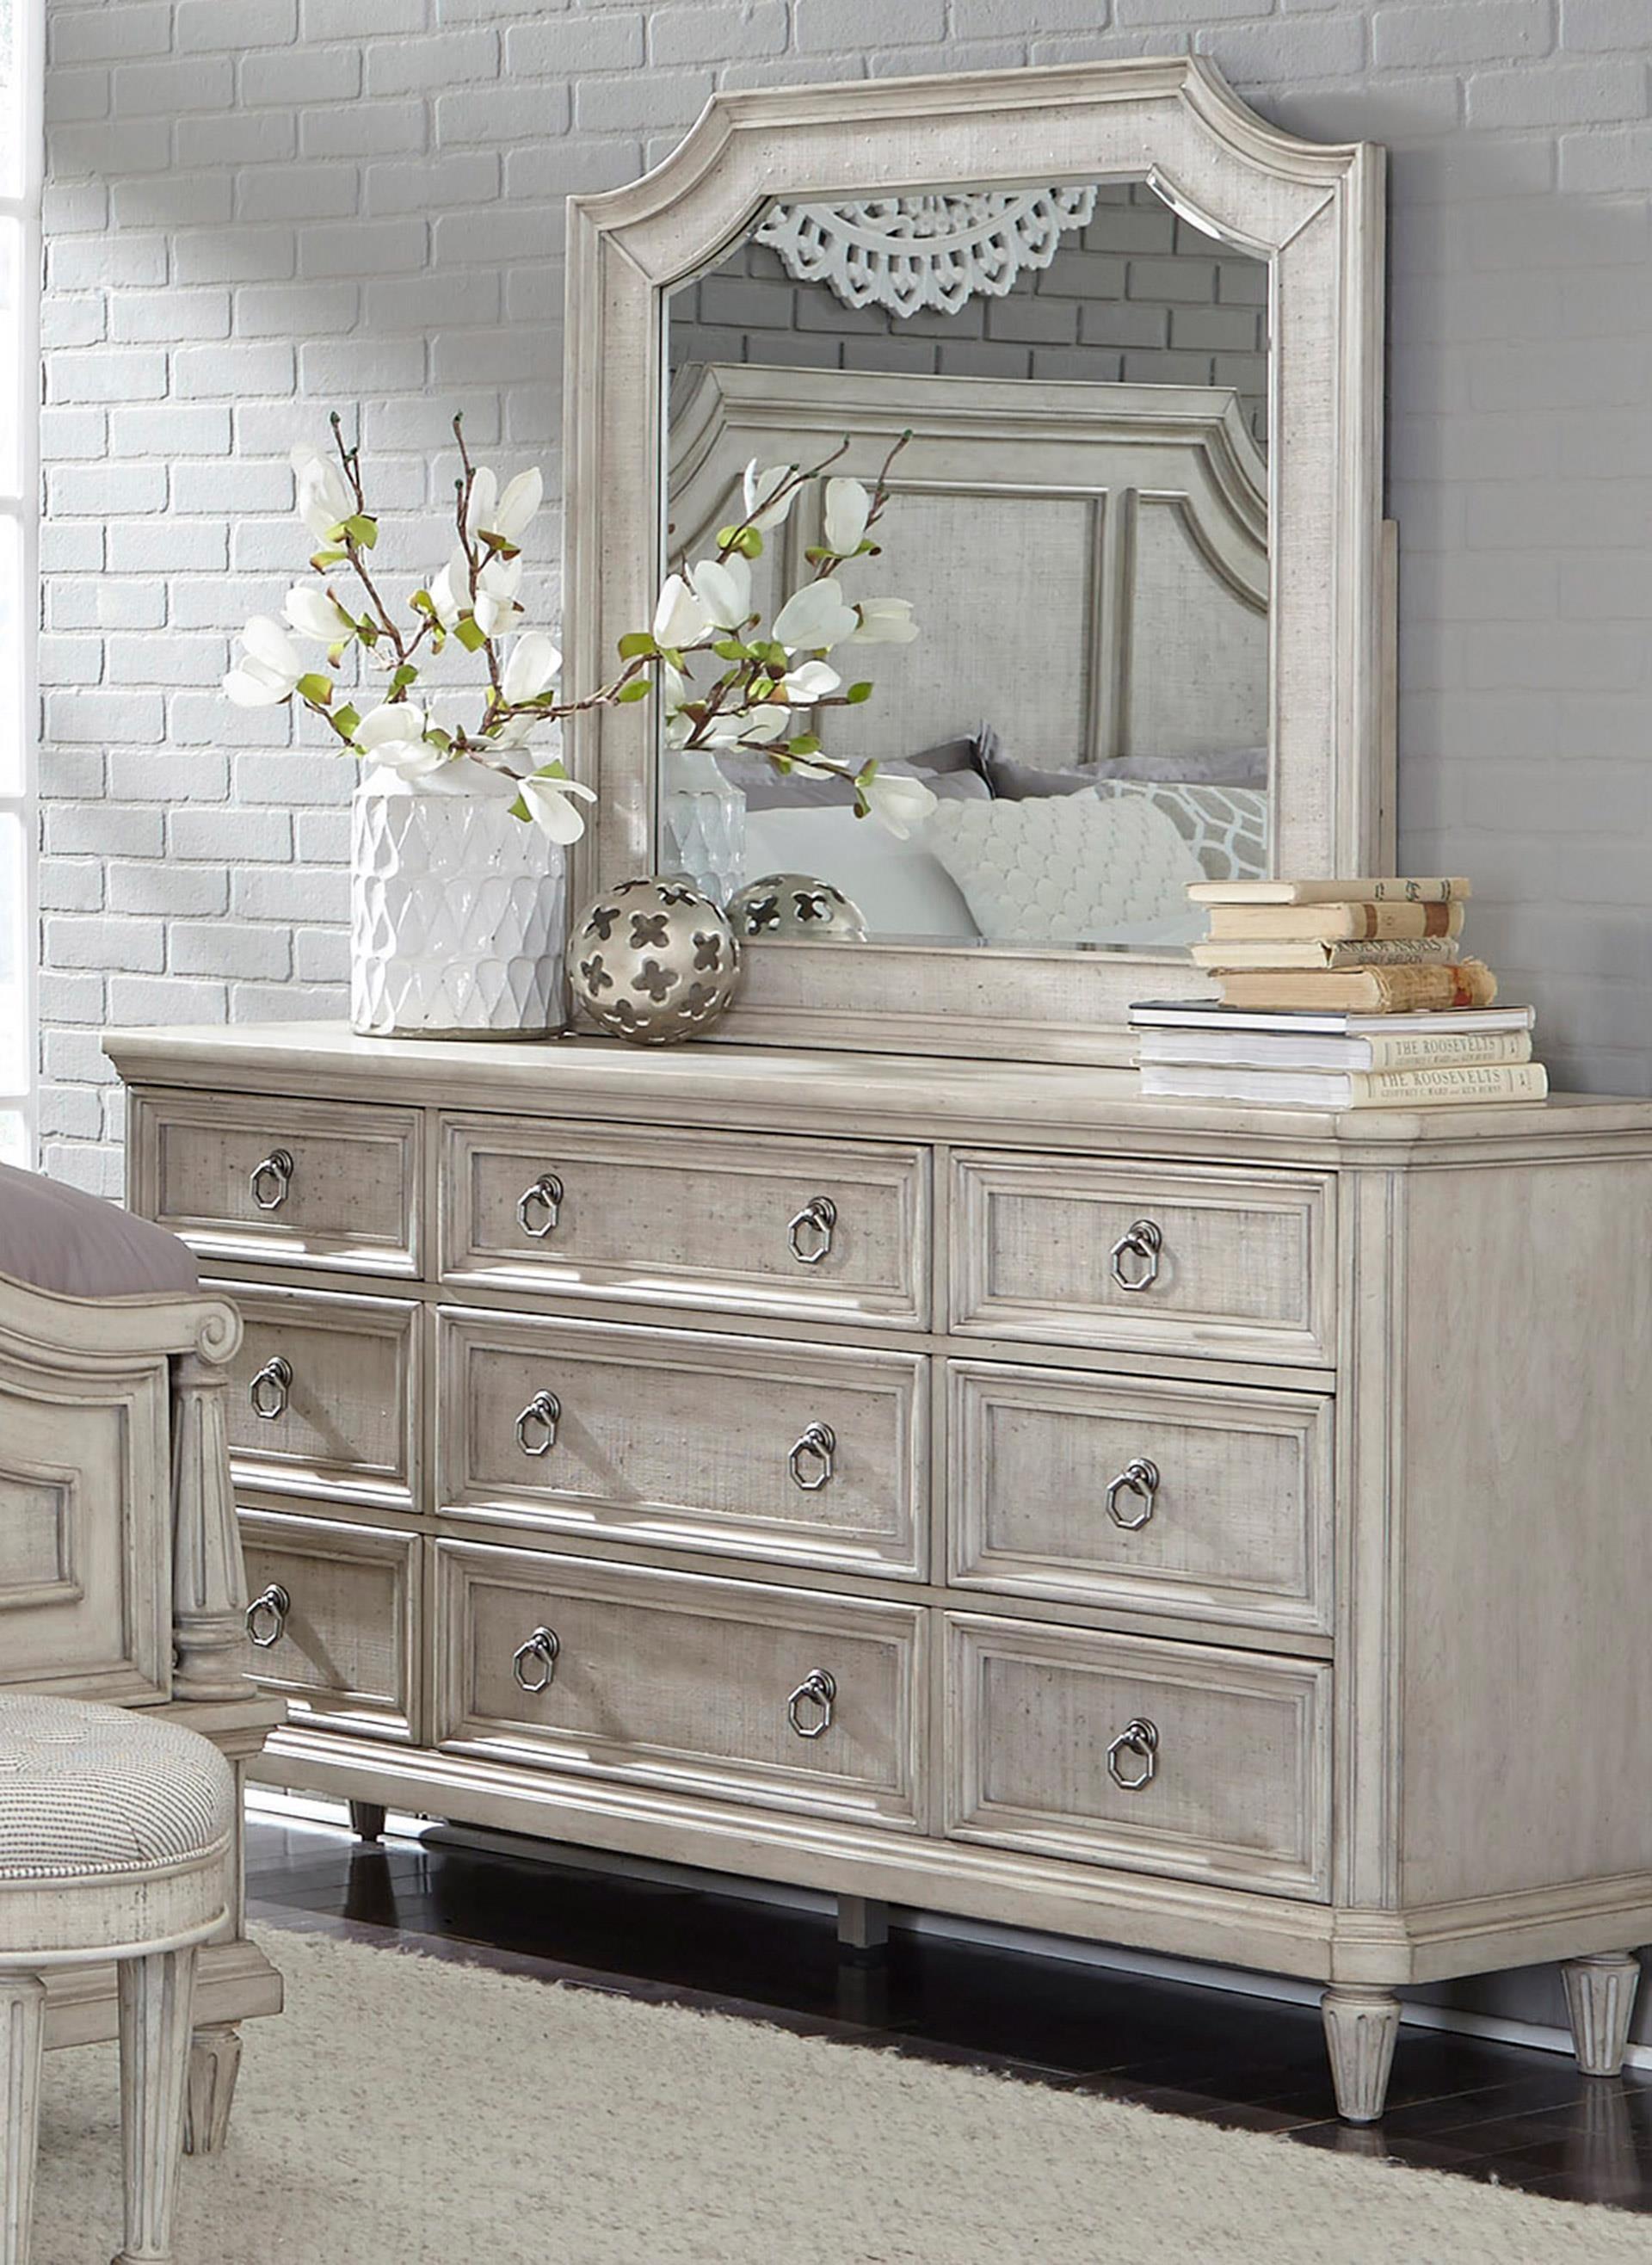 Pulaski Furniture Campbell Street Dresser & Mirror - Item Number: GRP-P1231XX-DRM